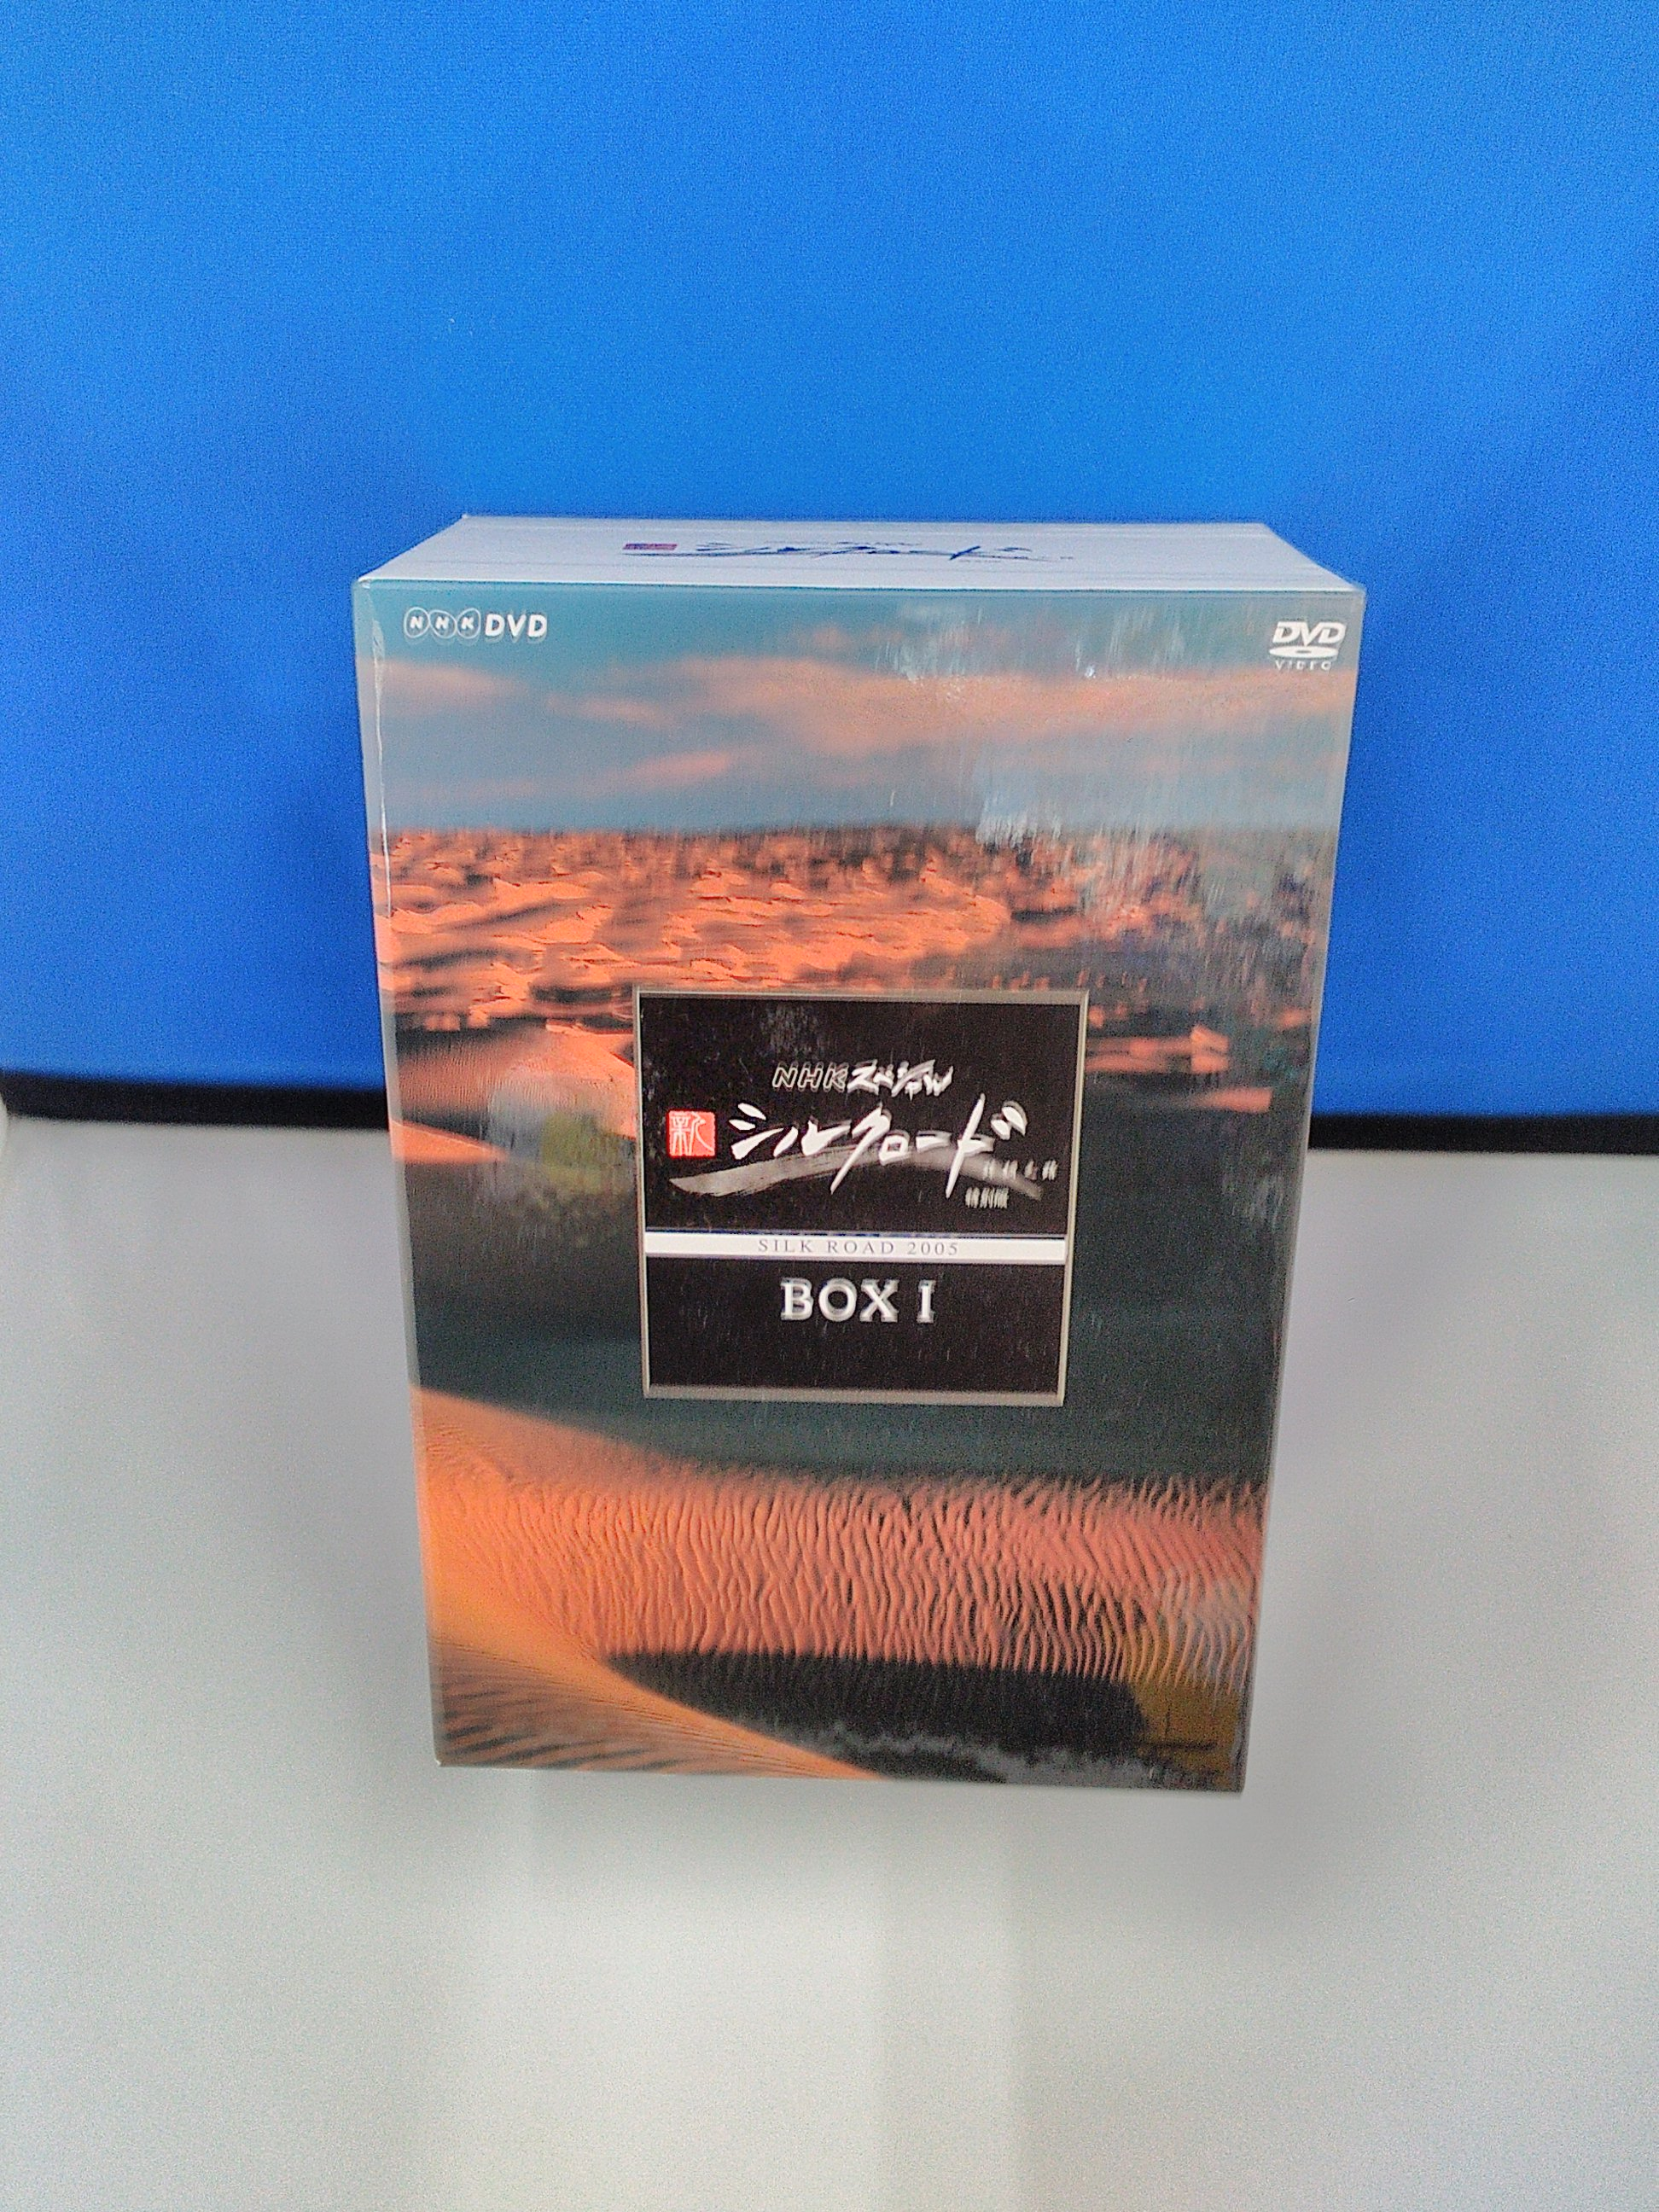 NHKスペシャル シルクロード DVD-BOX|NHK